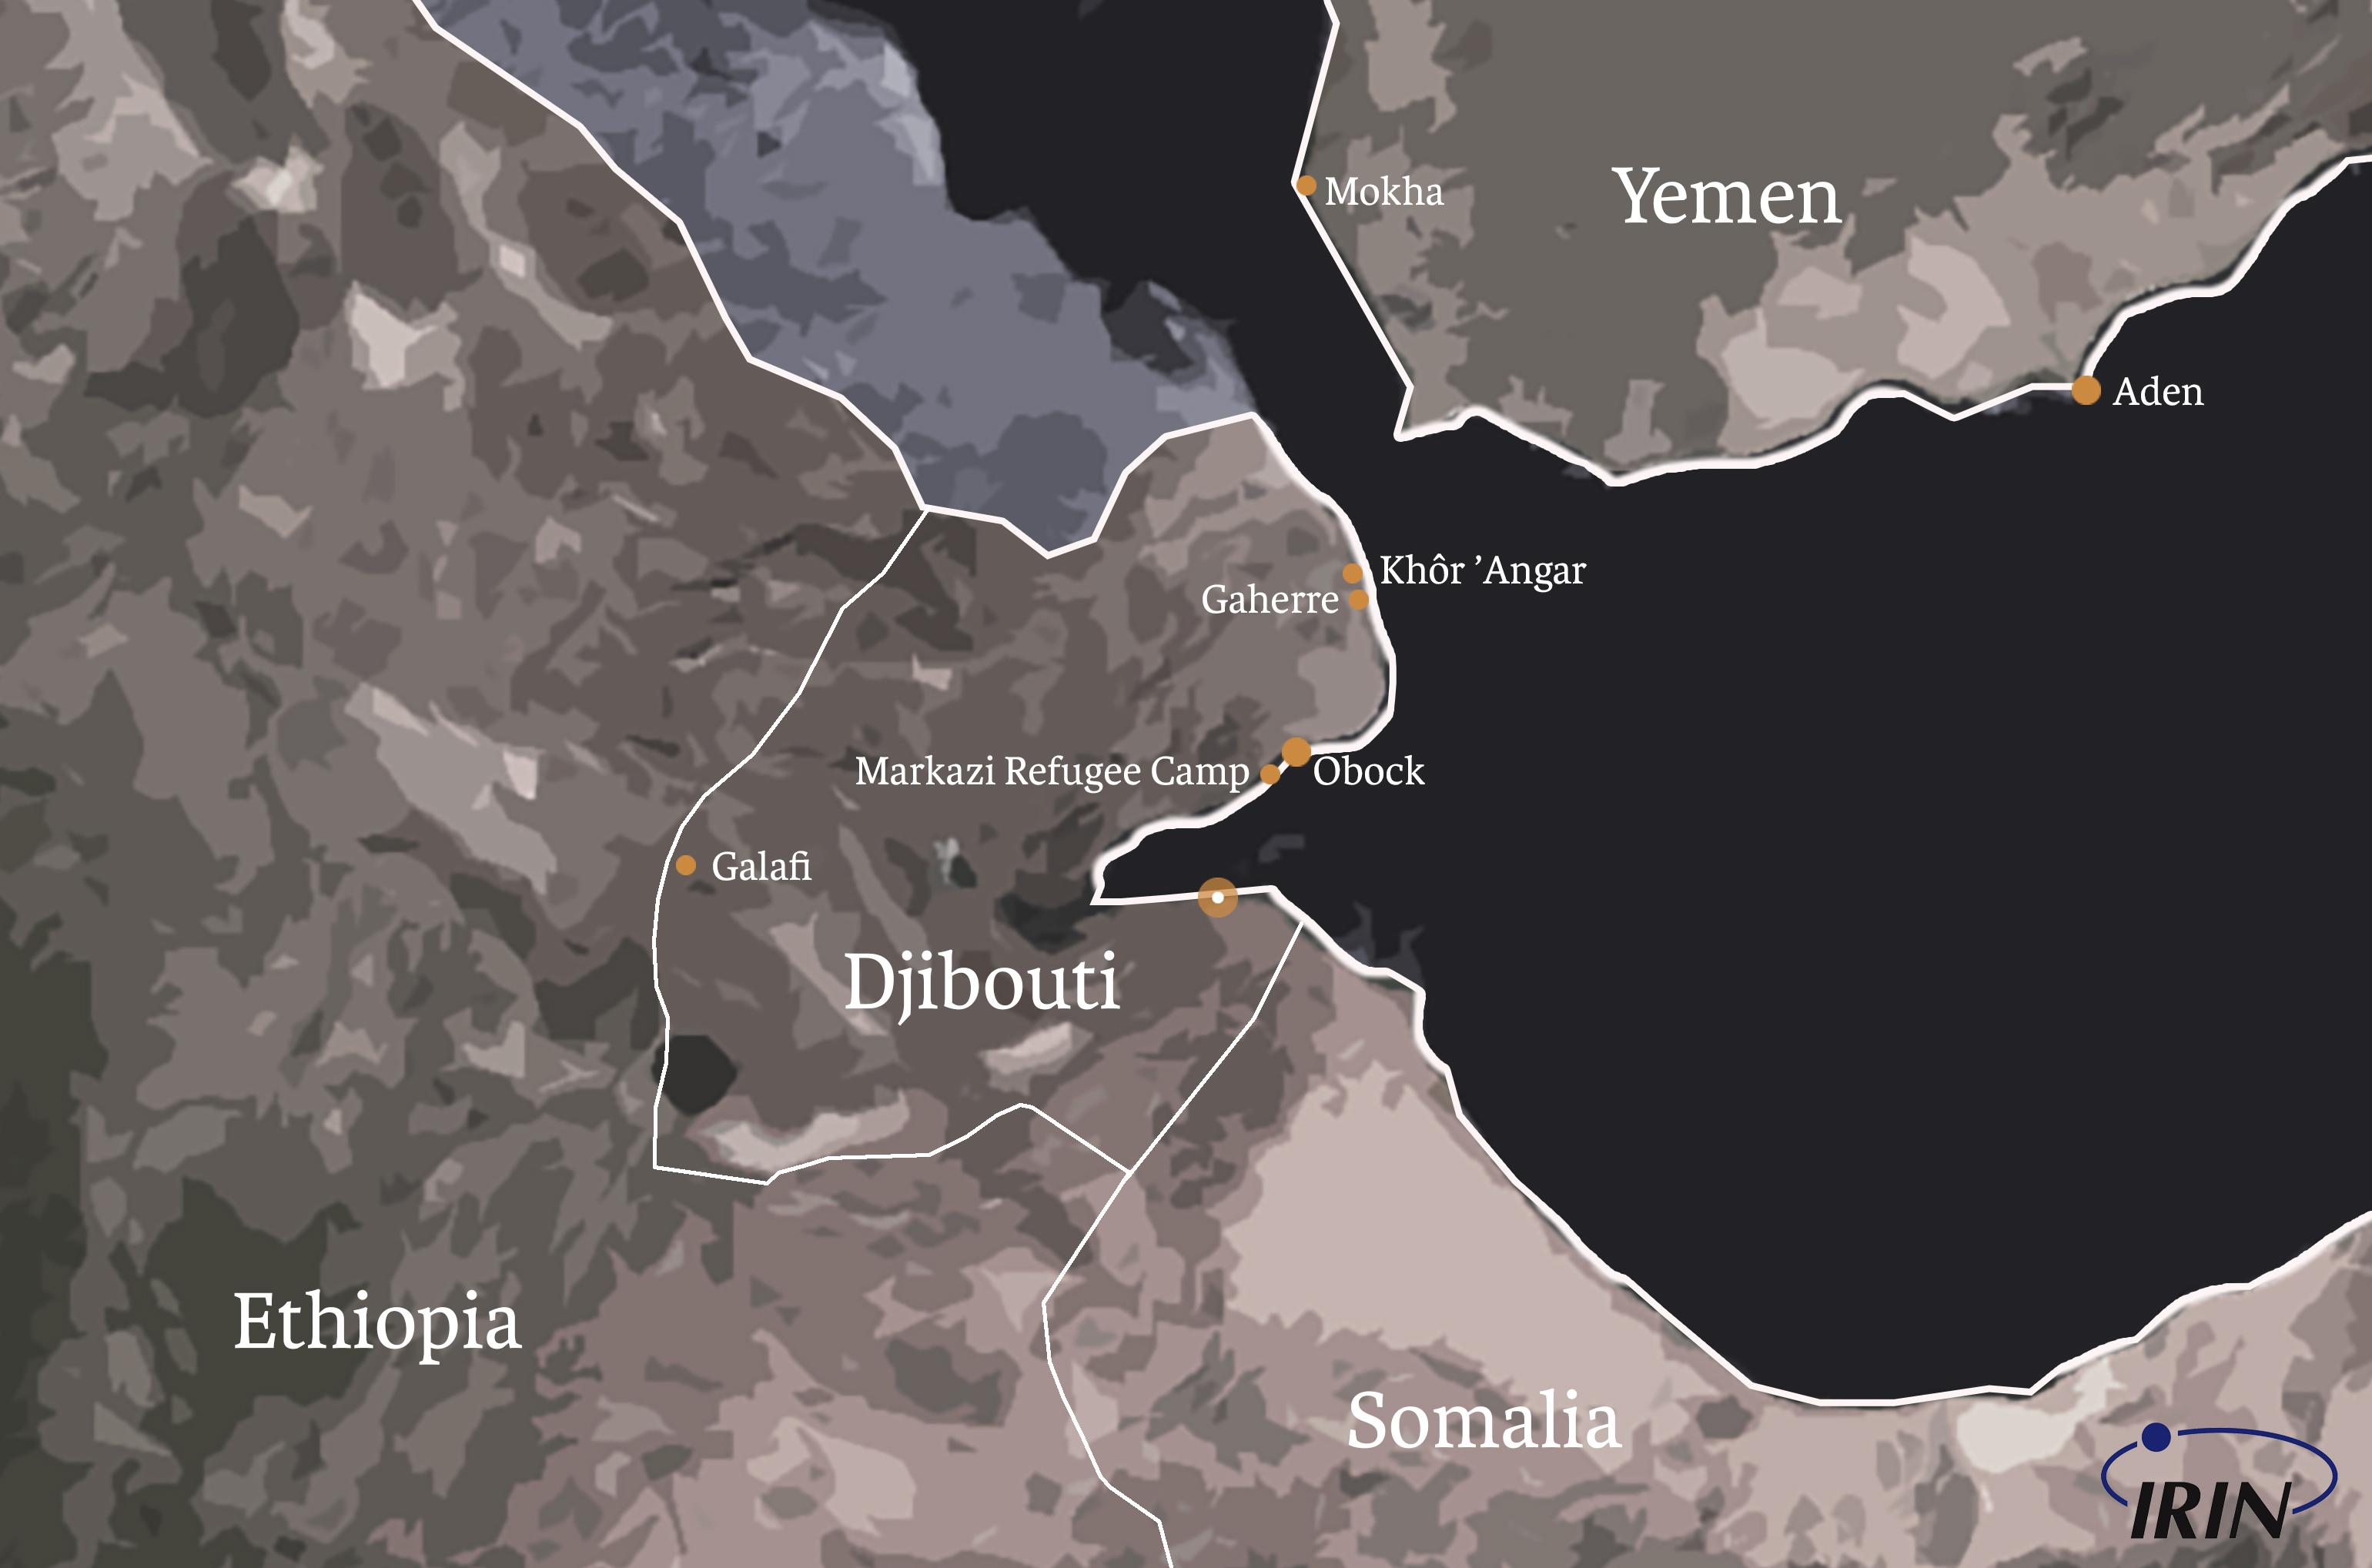 Yemeni refugees seek shelter in Djibouti     Al Jazeera  Yemen And Djibouti